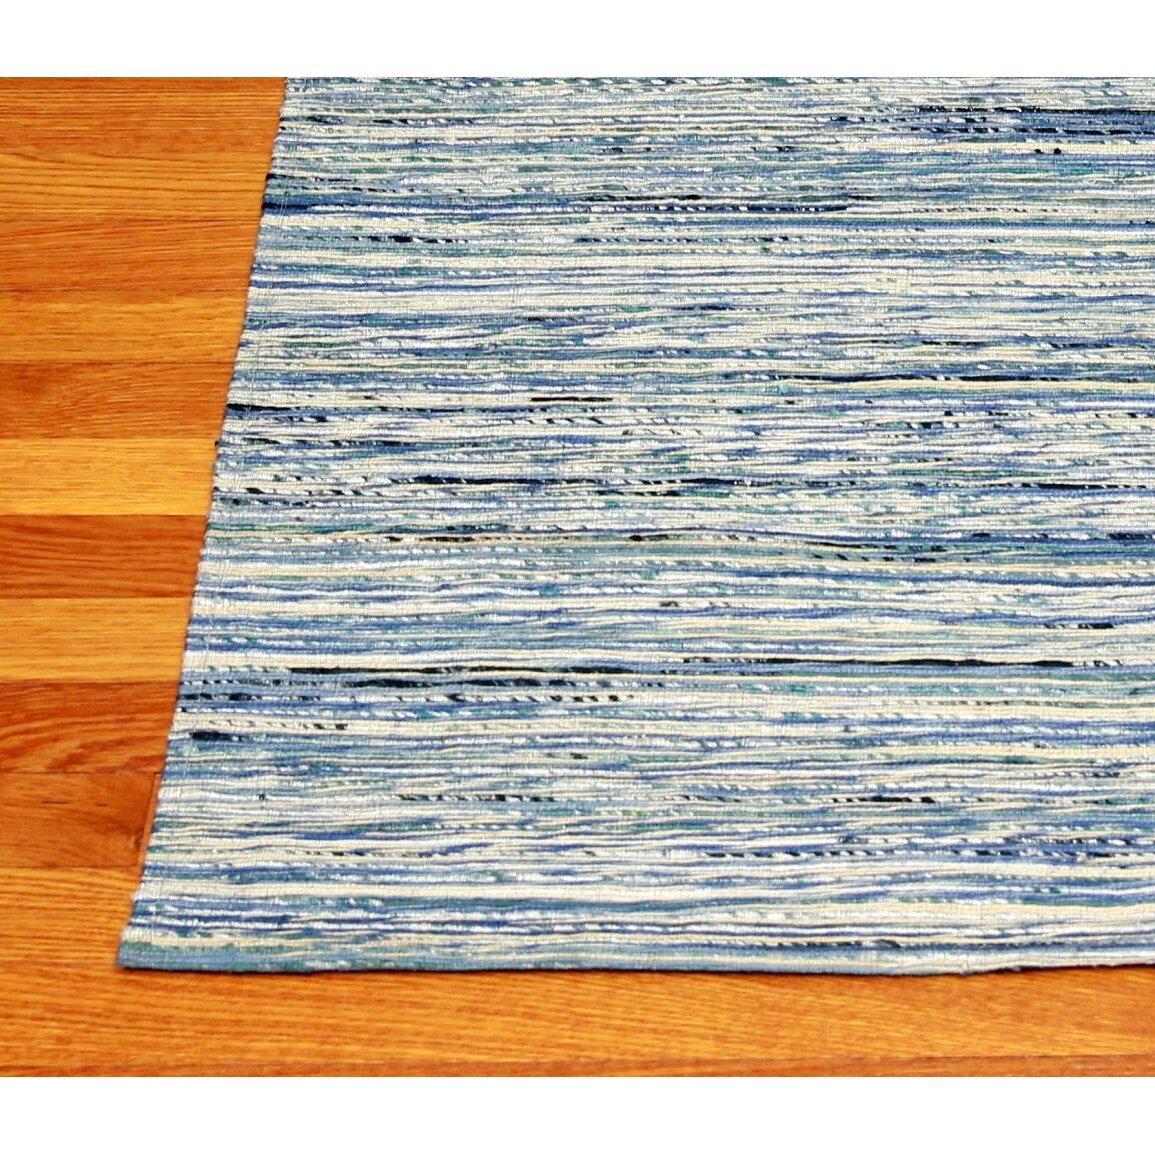 mats inc sari silk and jute hand woven gray light blue area rug wayfair. Black Bedroom Furniture Sets. Home Design Ideas